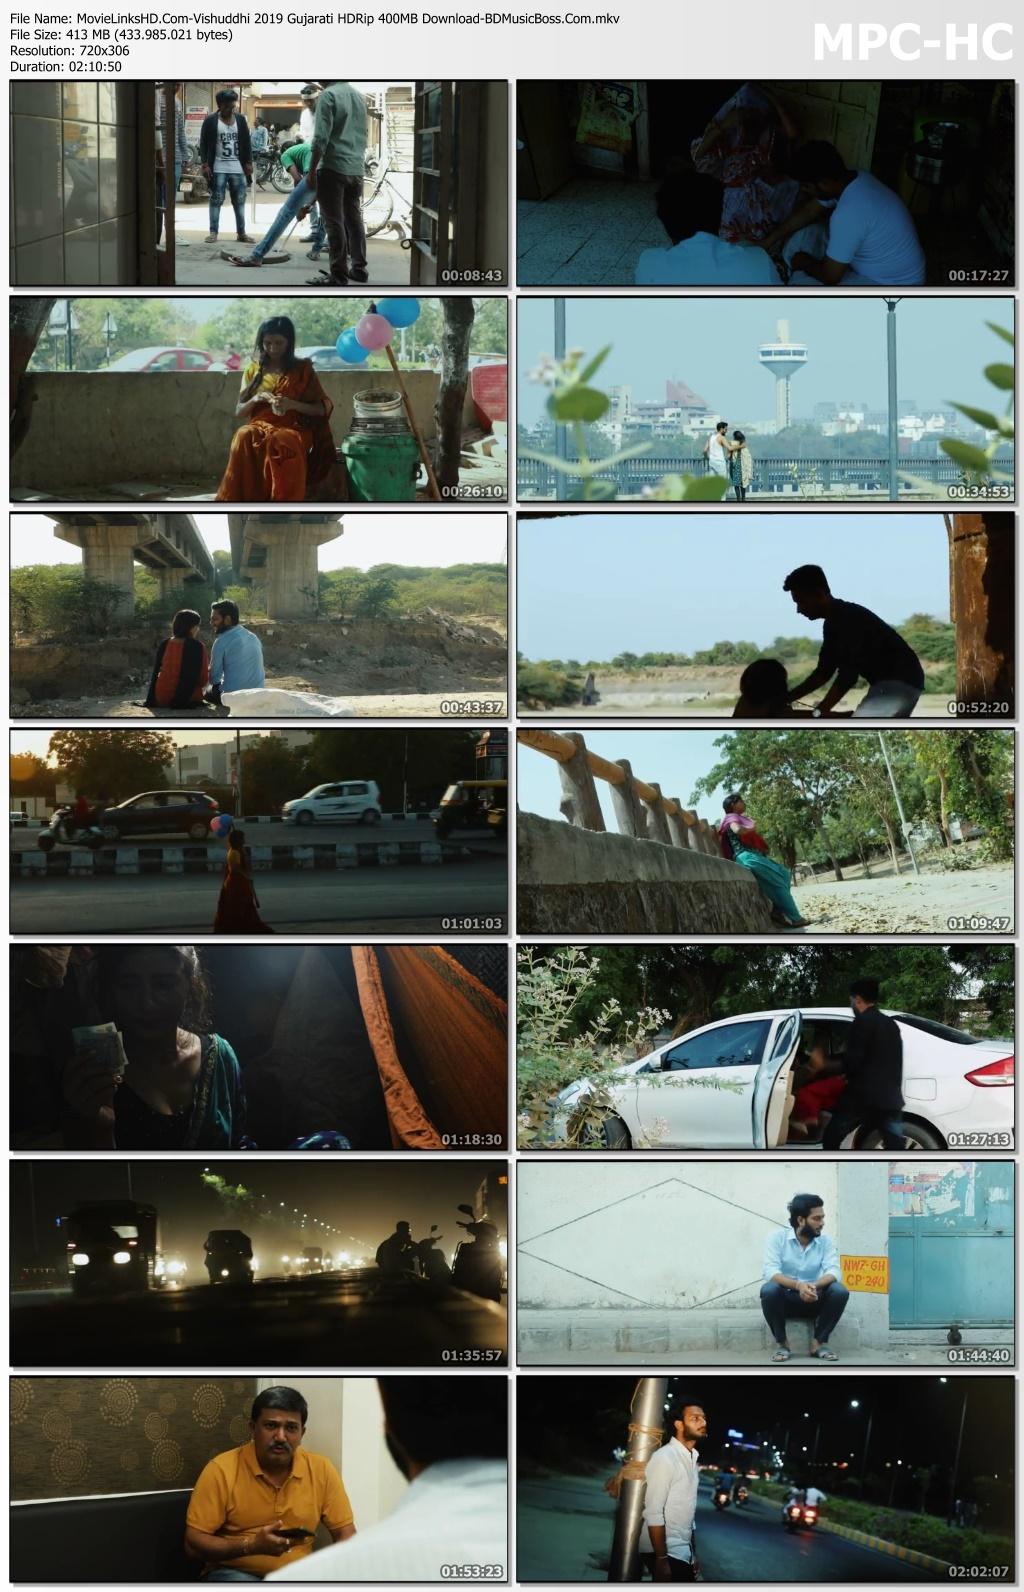 Movie-Links-HD-Com-Vishuddhi-2019-Gujarati-HDRip-400-MB-Download-BDMusic-Boss-Com-mkv-thumbs